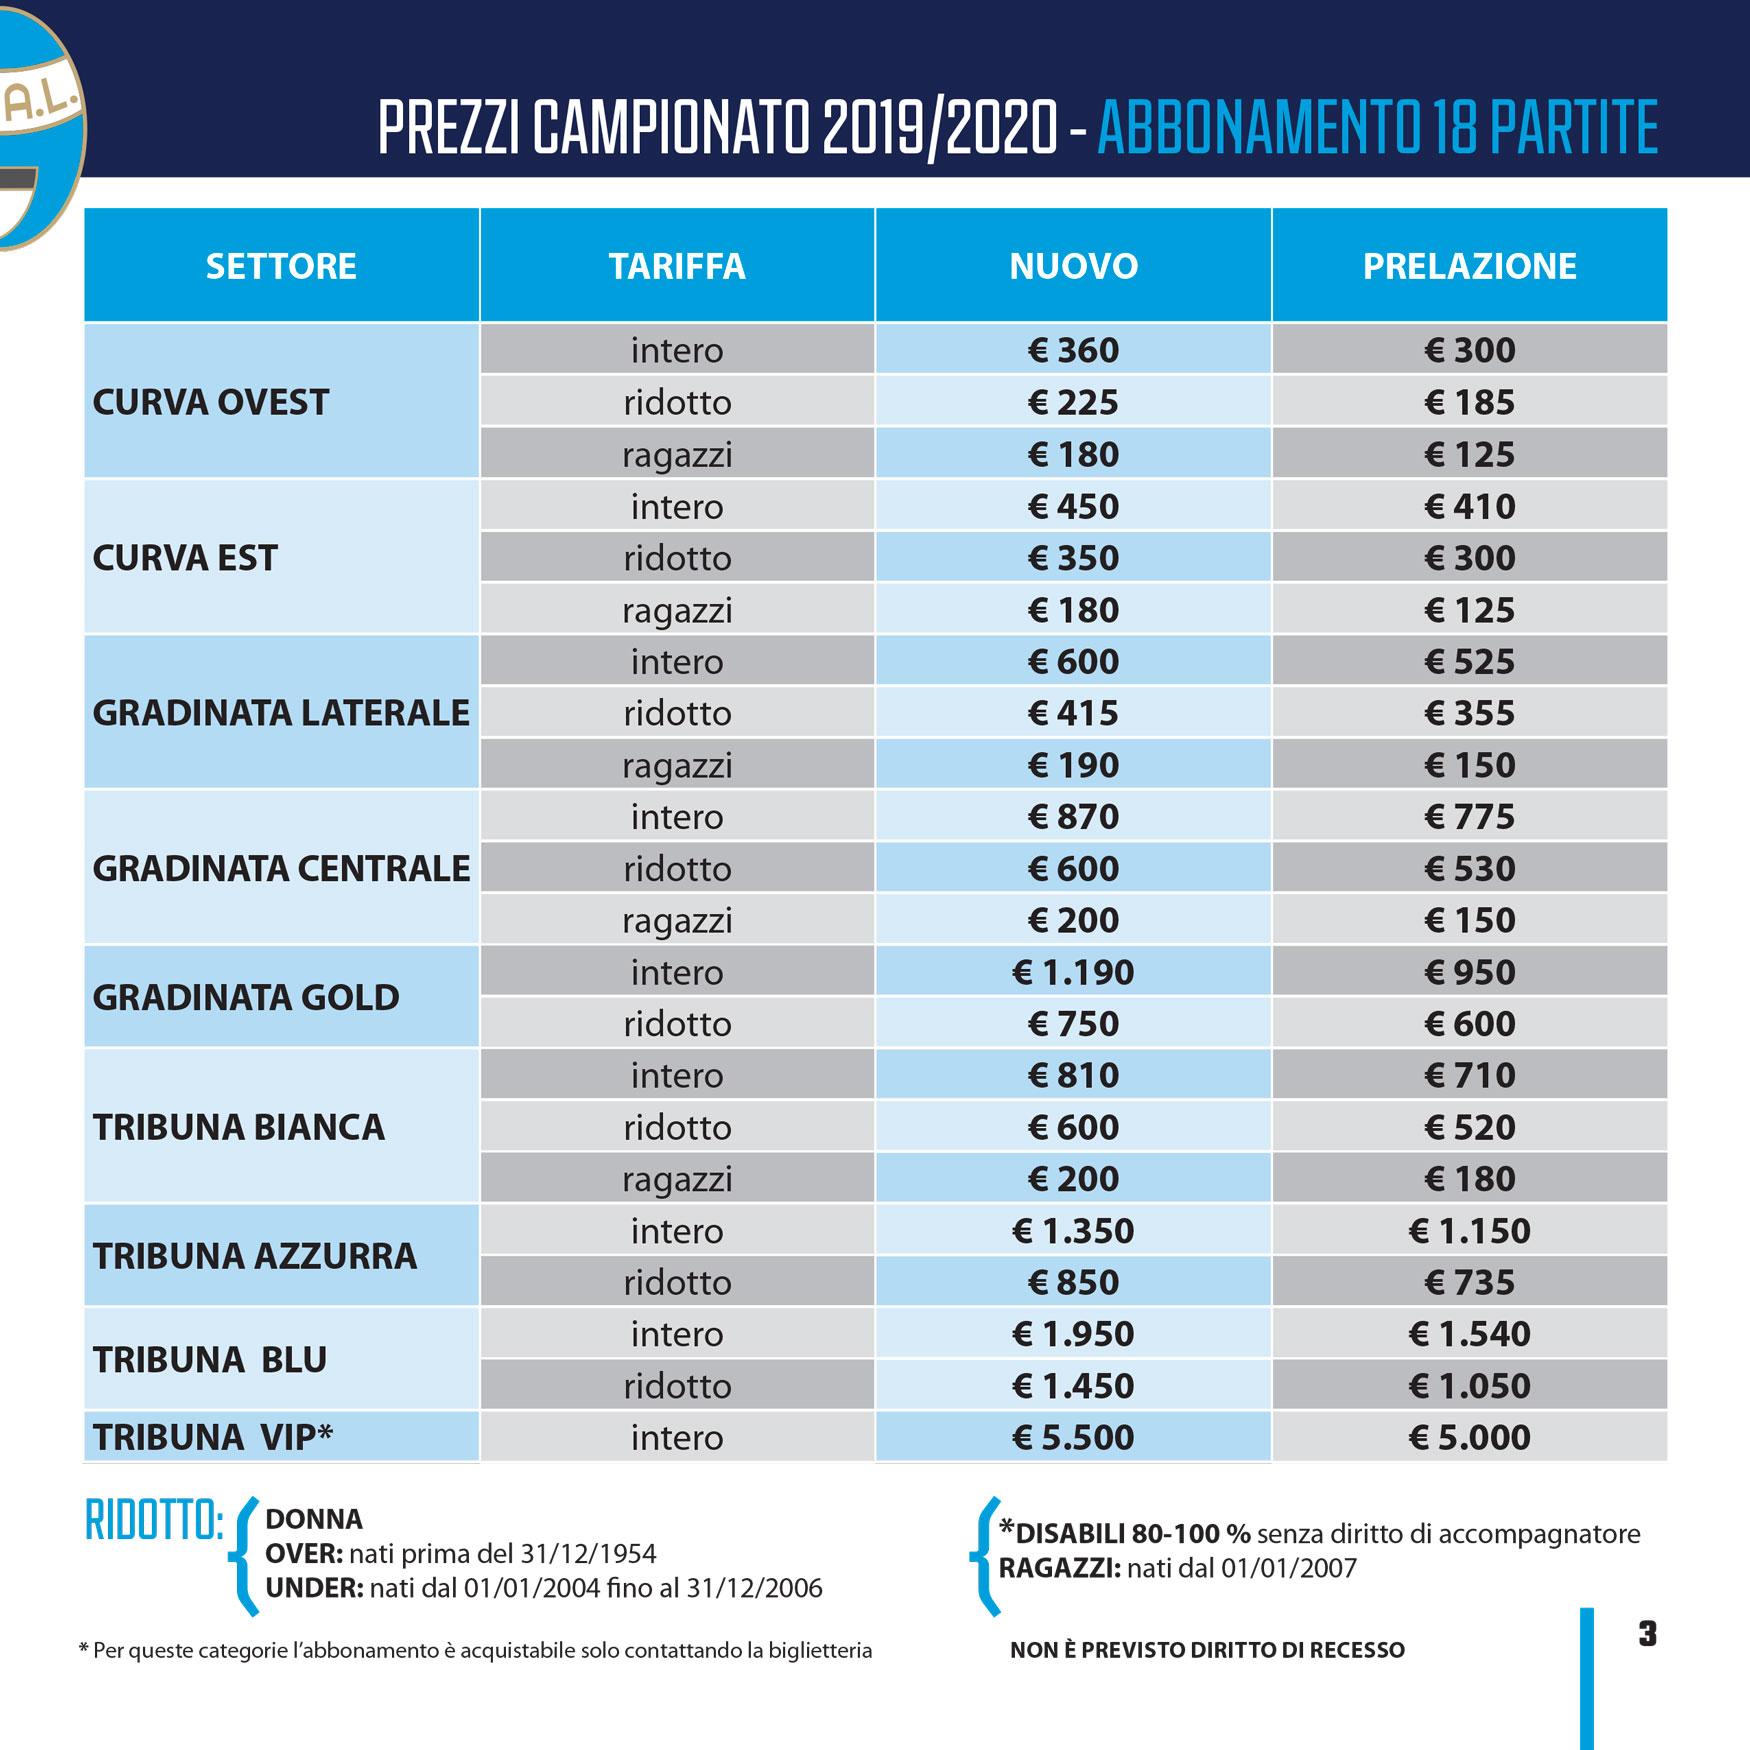 Calendario Partite Spal 2020.Campagna Abbonamenti Spal 2019 2020